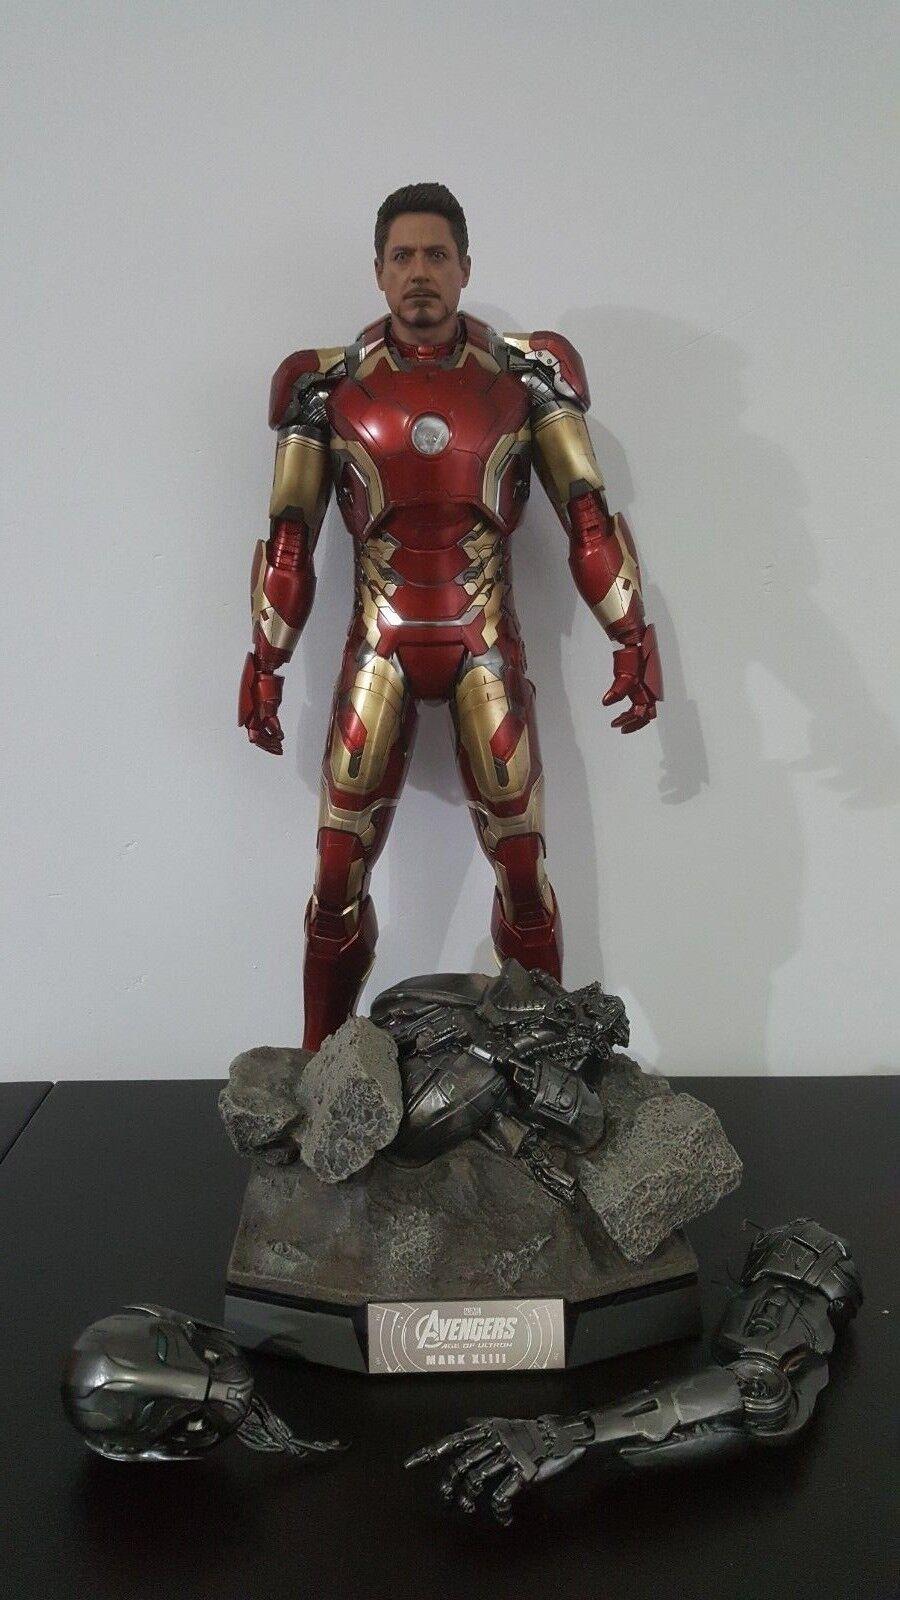 Hot Toys Iron Femme Mark XLIII XLIII XLIII MK 43 Avengers Age Of Ultron AoU QS005 1/4 scale 0bb333